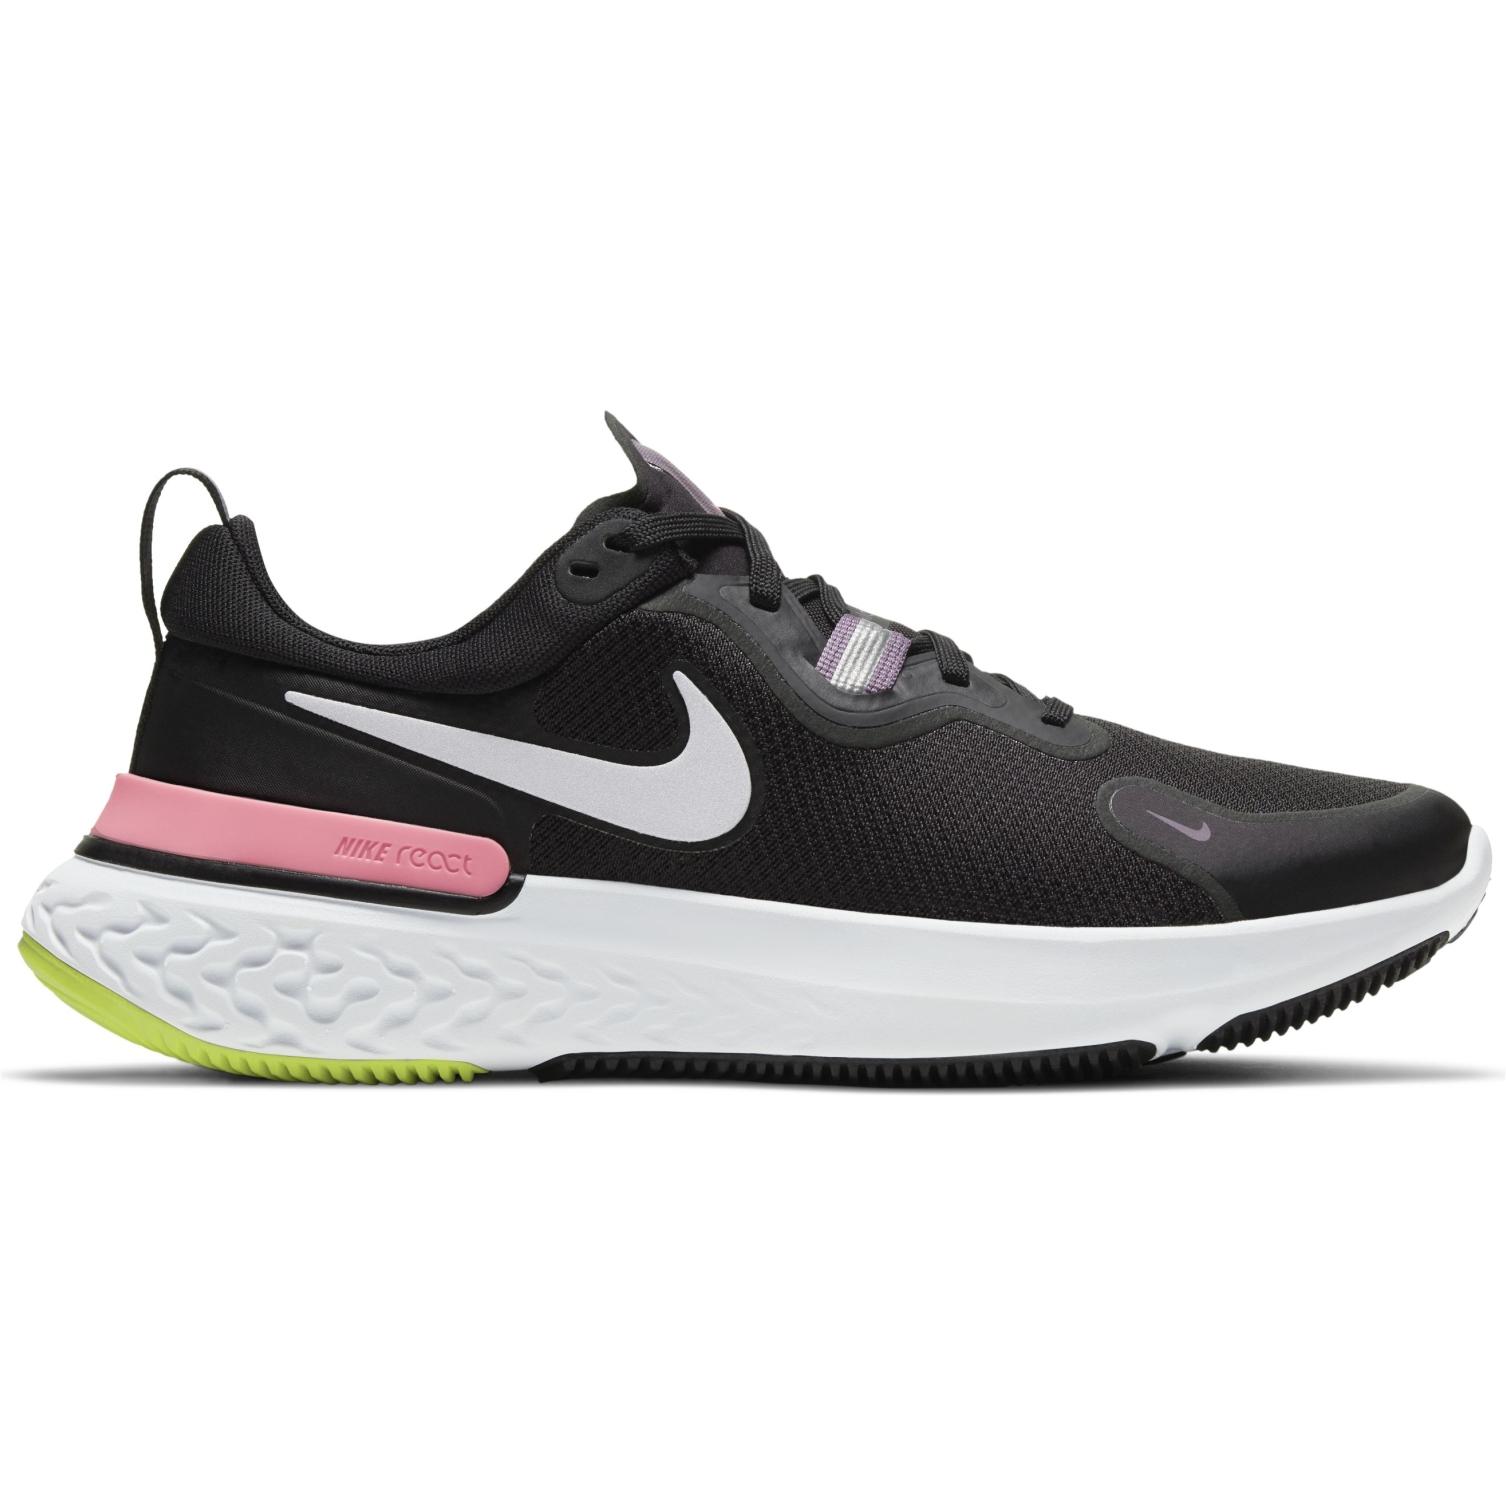 Nike React Miler Zapatillas de correr para mujer - black/metallic silver-violet dust CW1778-012